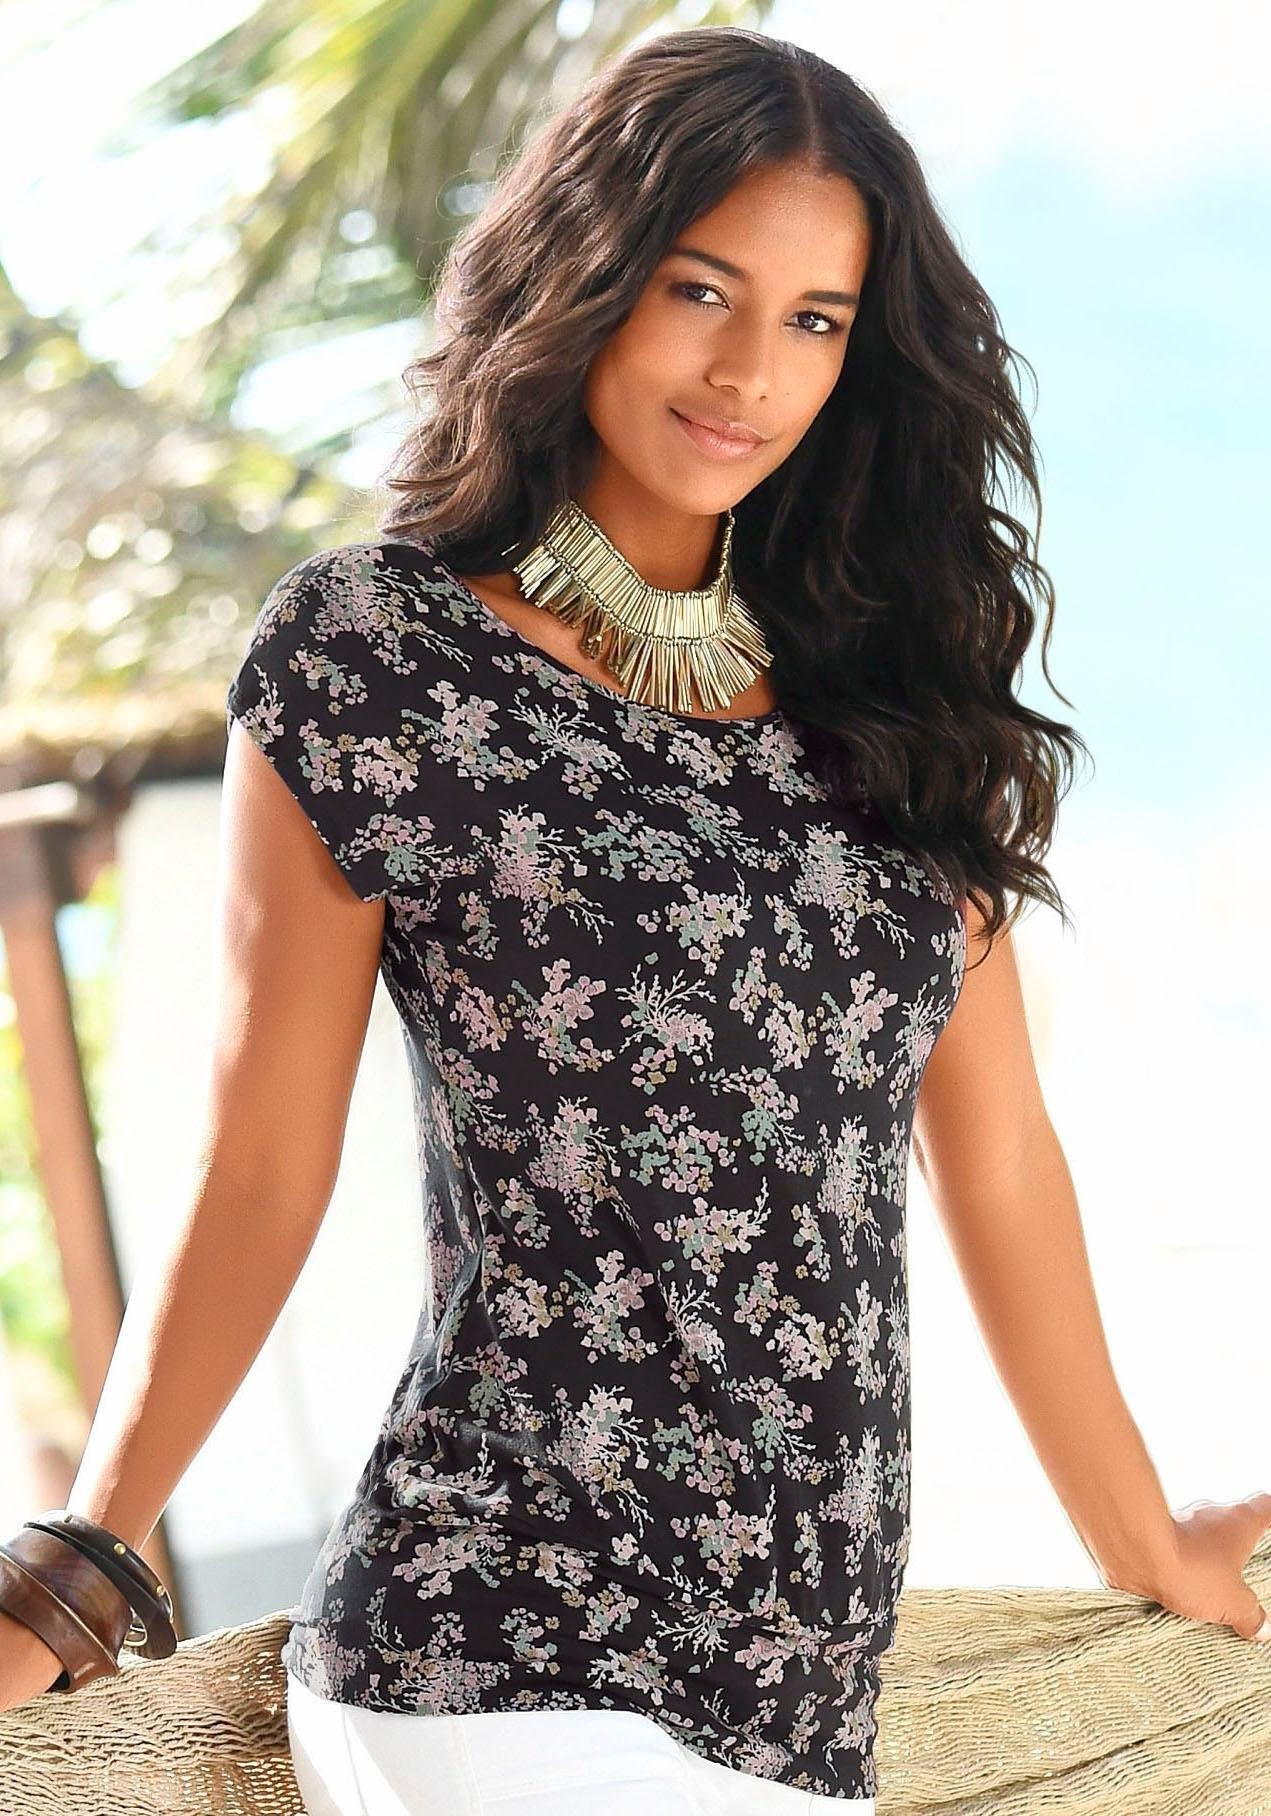 LASCANA shirt met bloemenprint allover - verschillende betaalmethodes